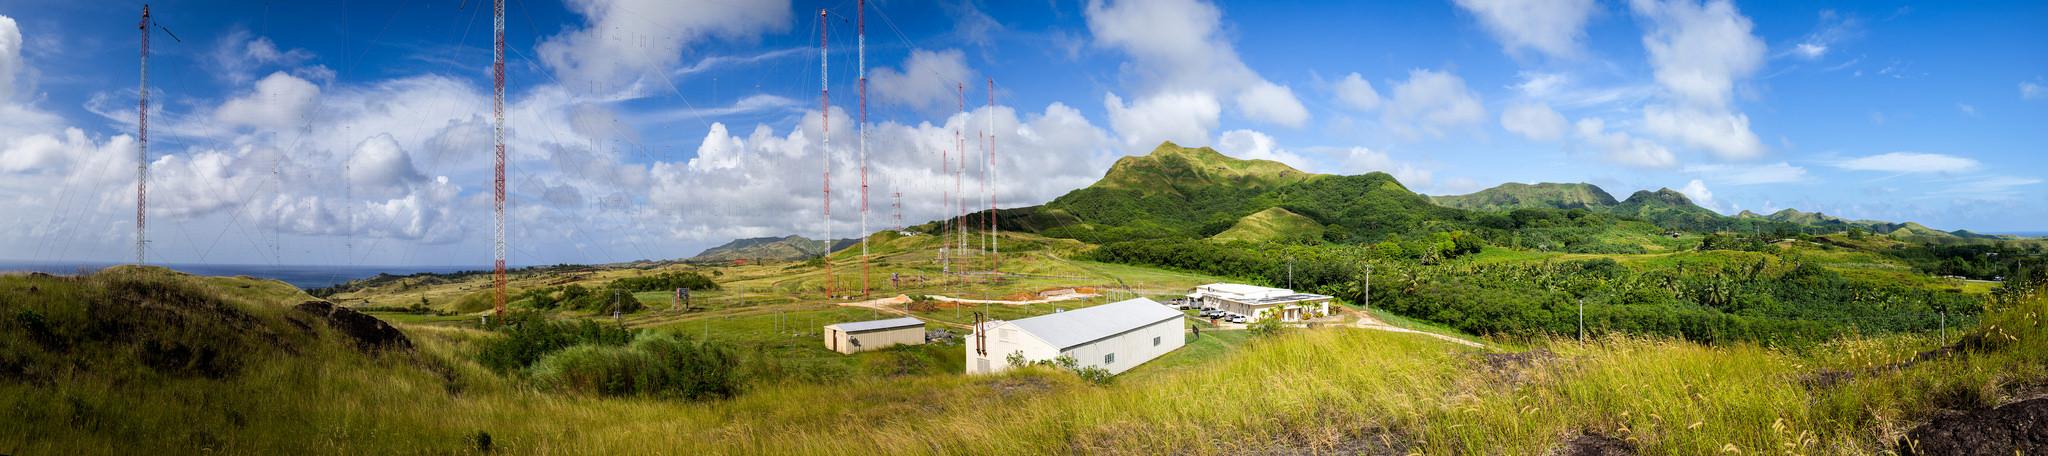 KTWR Guam